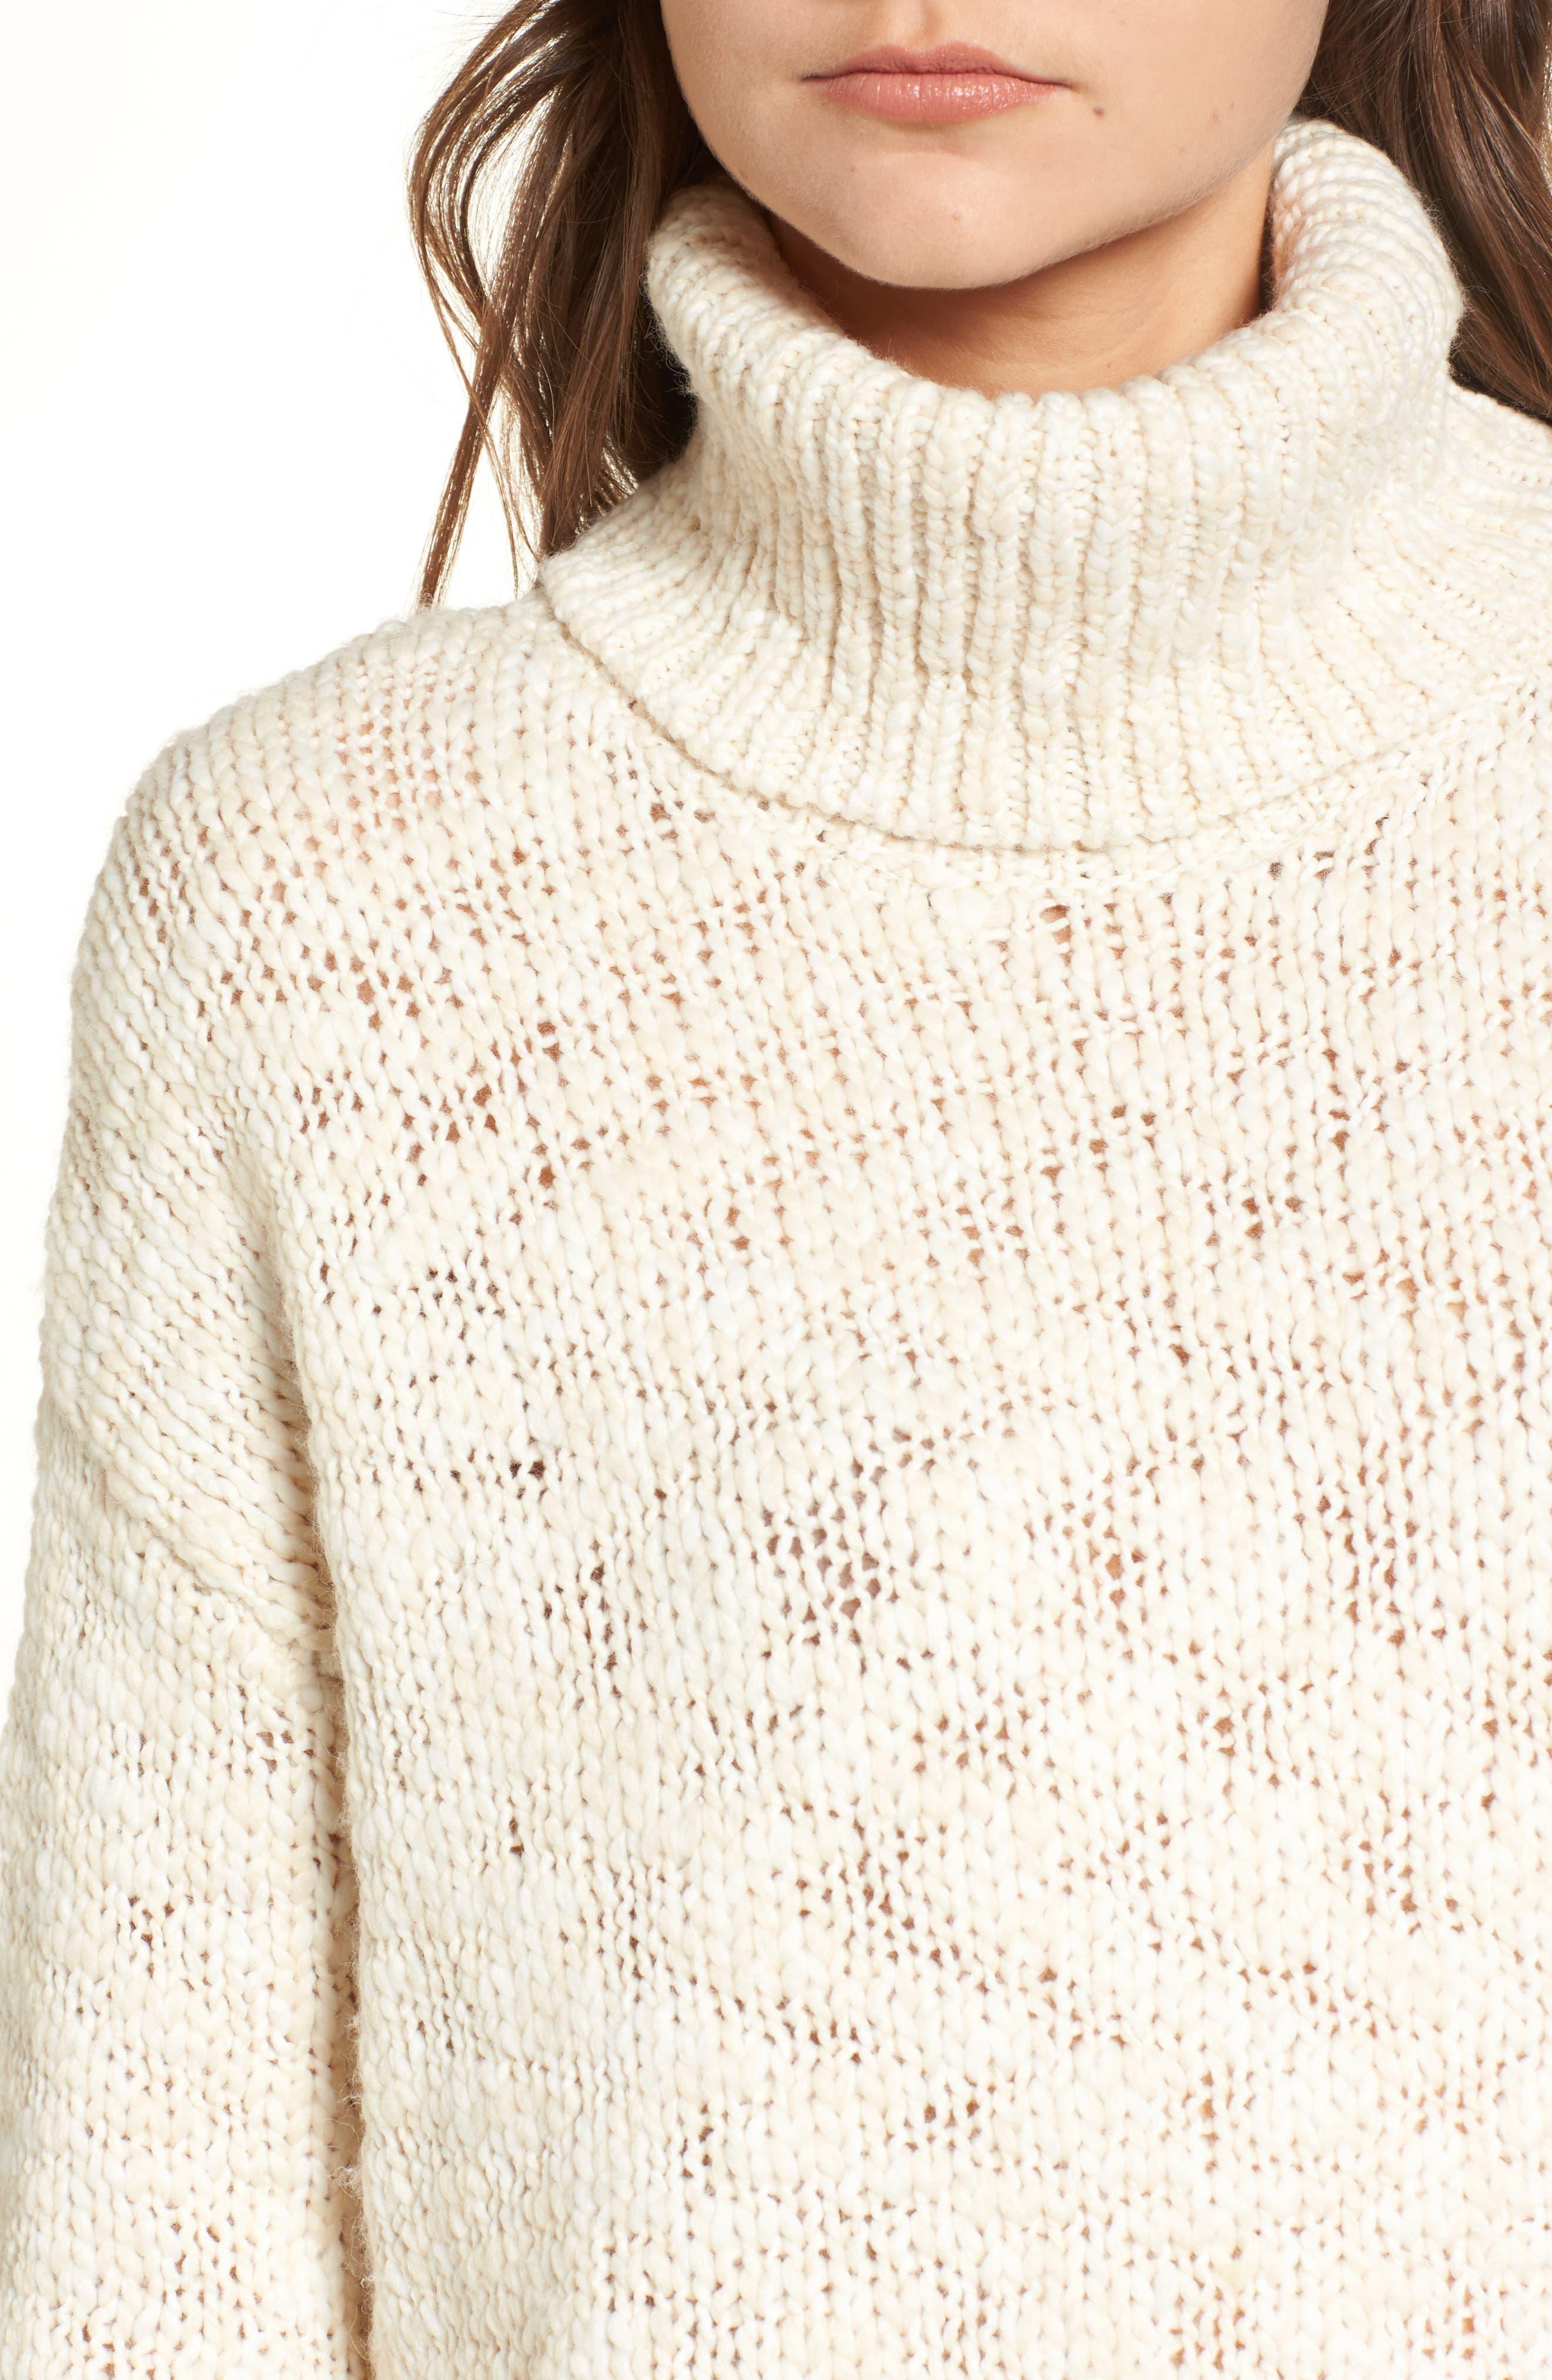 Treasure&Bond Turtleneck Sweater,                             Alternate thumbnail 4, color,                             BEIGE BEACH COMBO